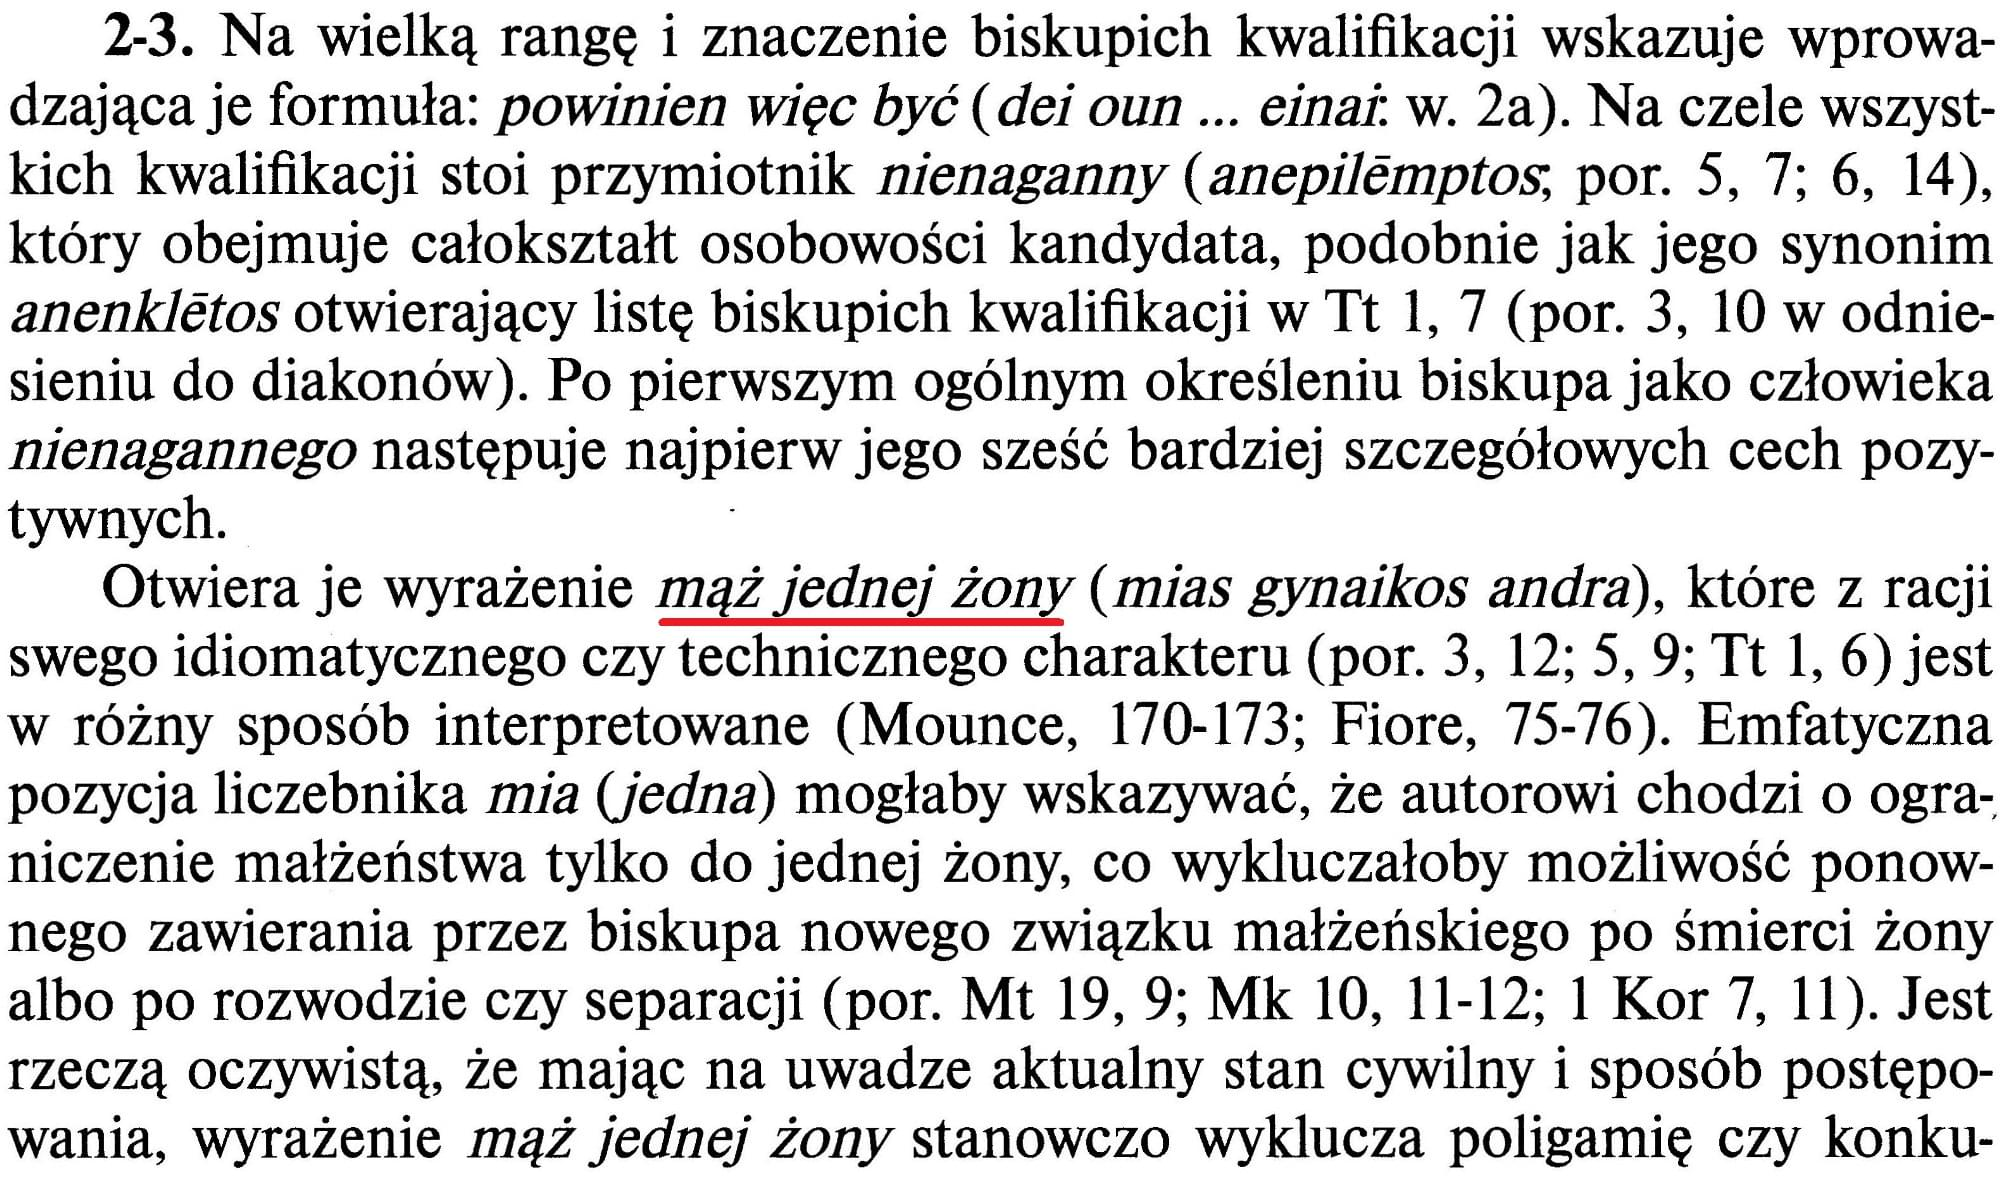 1 i 2 List do Tymoteusza List do Tytusa